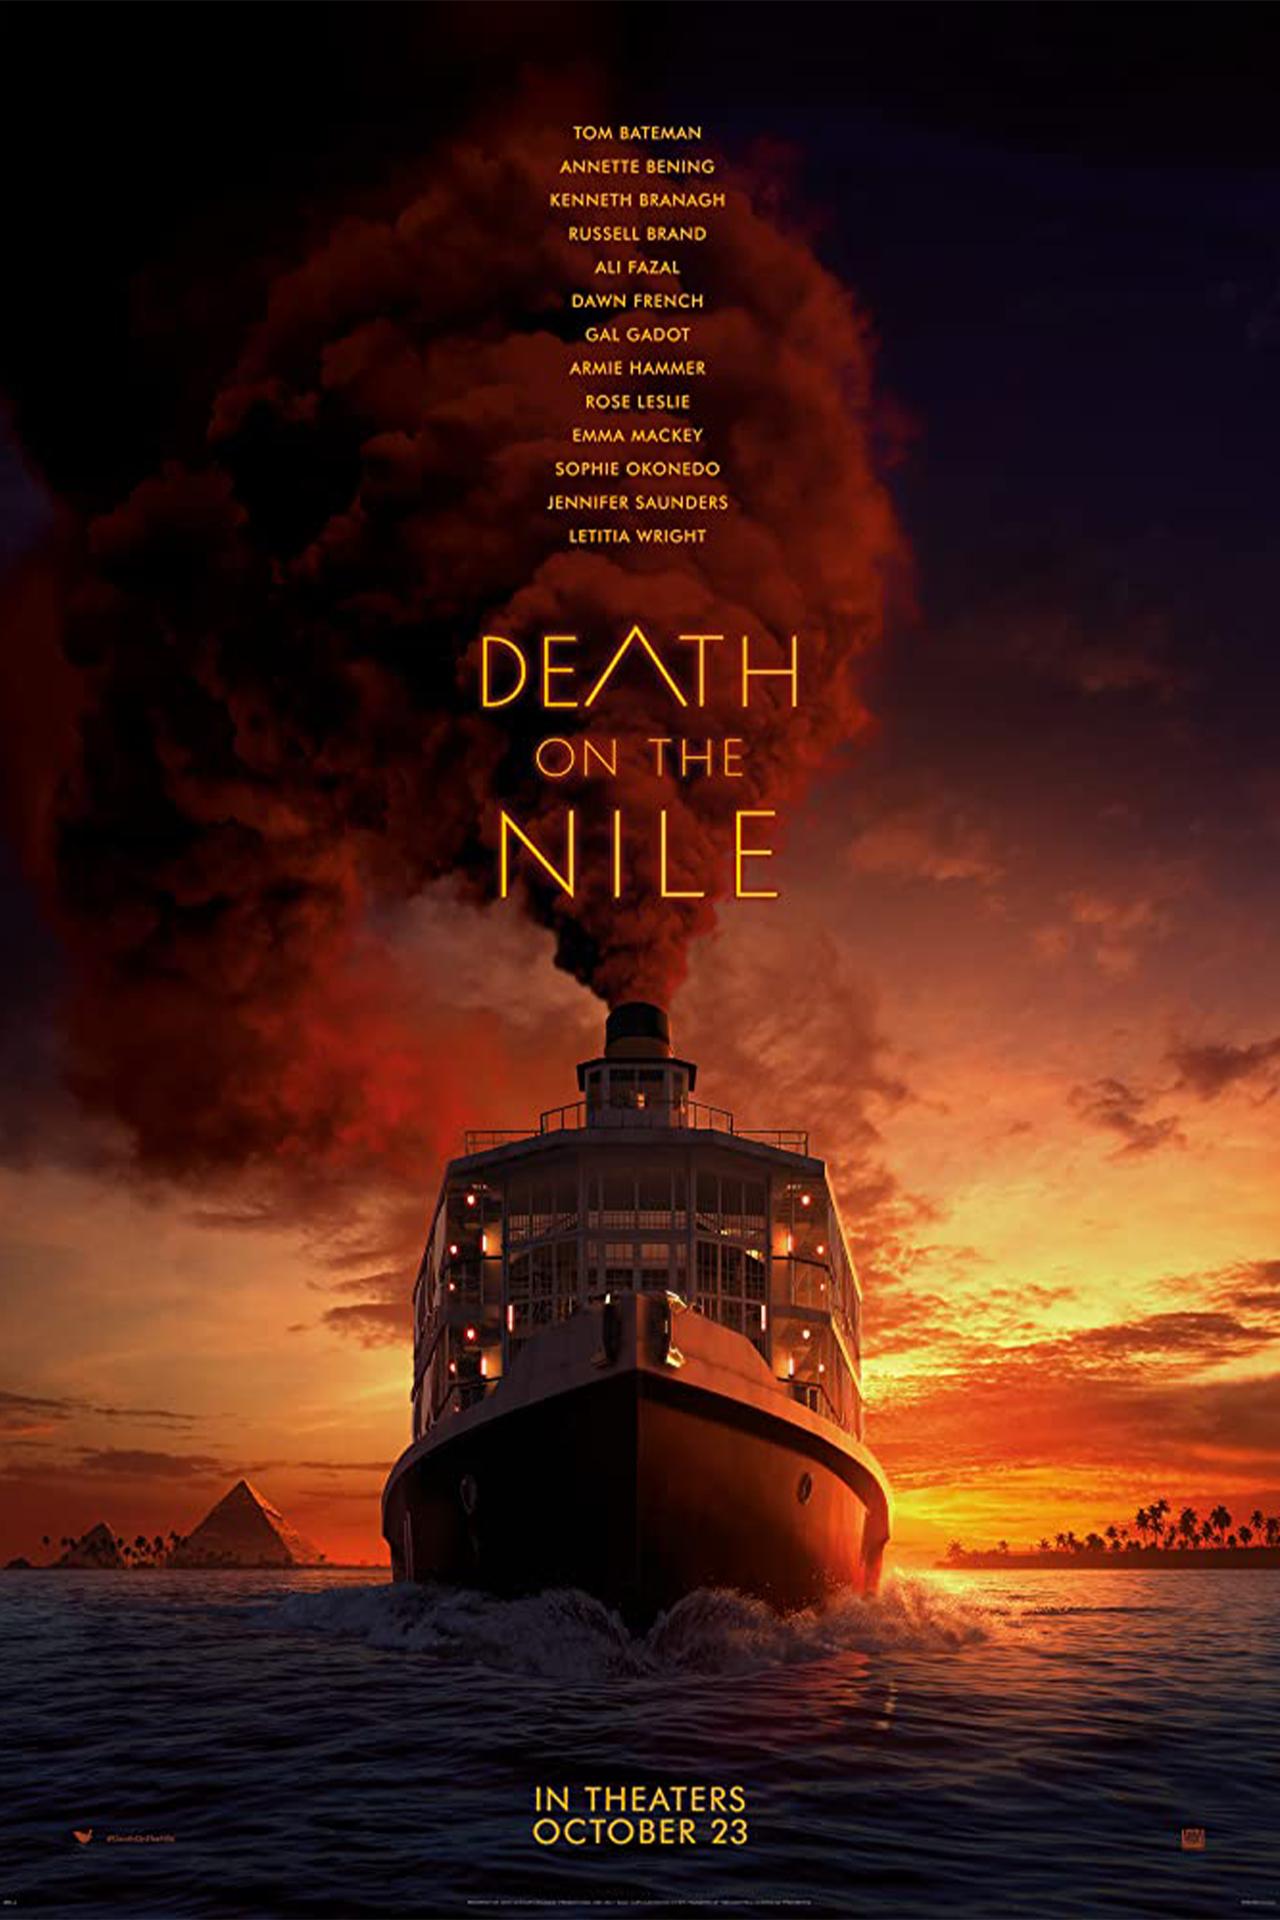 Death on the Nile – Trailer